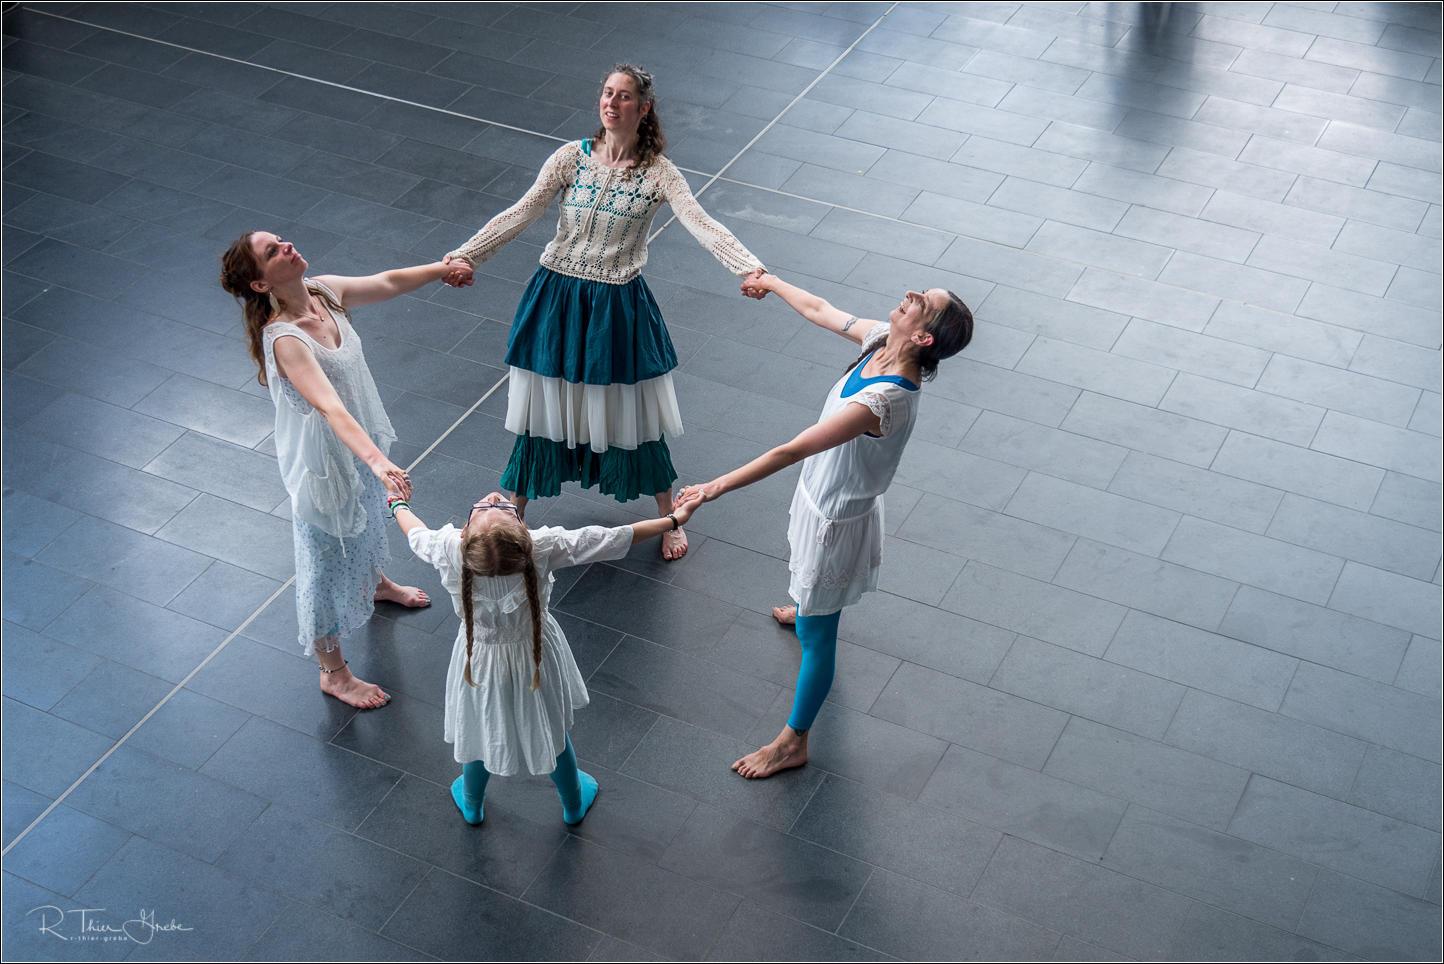 GWD Bremerhaven 2017 global dance